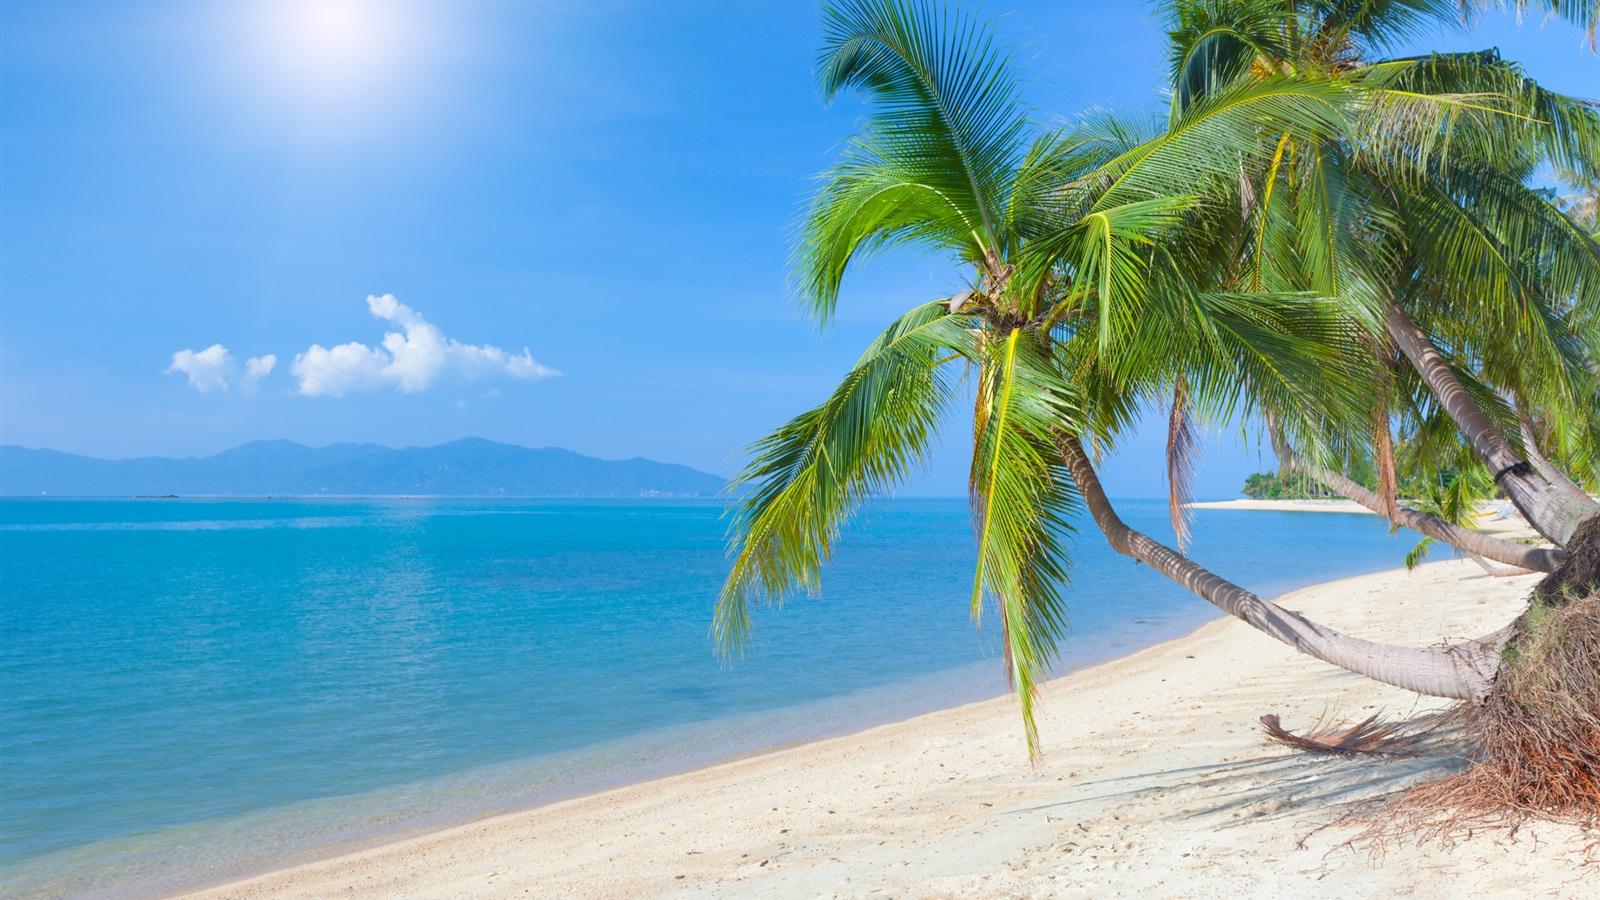 Hd Tropical Island Beach Paradise Wallpapers And Backgrounds: 壁纸 热带海滩,椰树,大海,天空,云,阳光 2560x1600 HD 高清壁纸, 图片, 照片